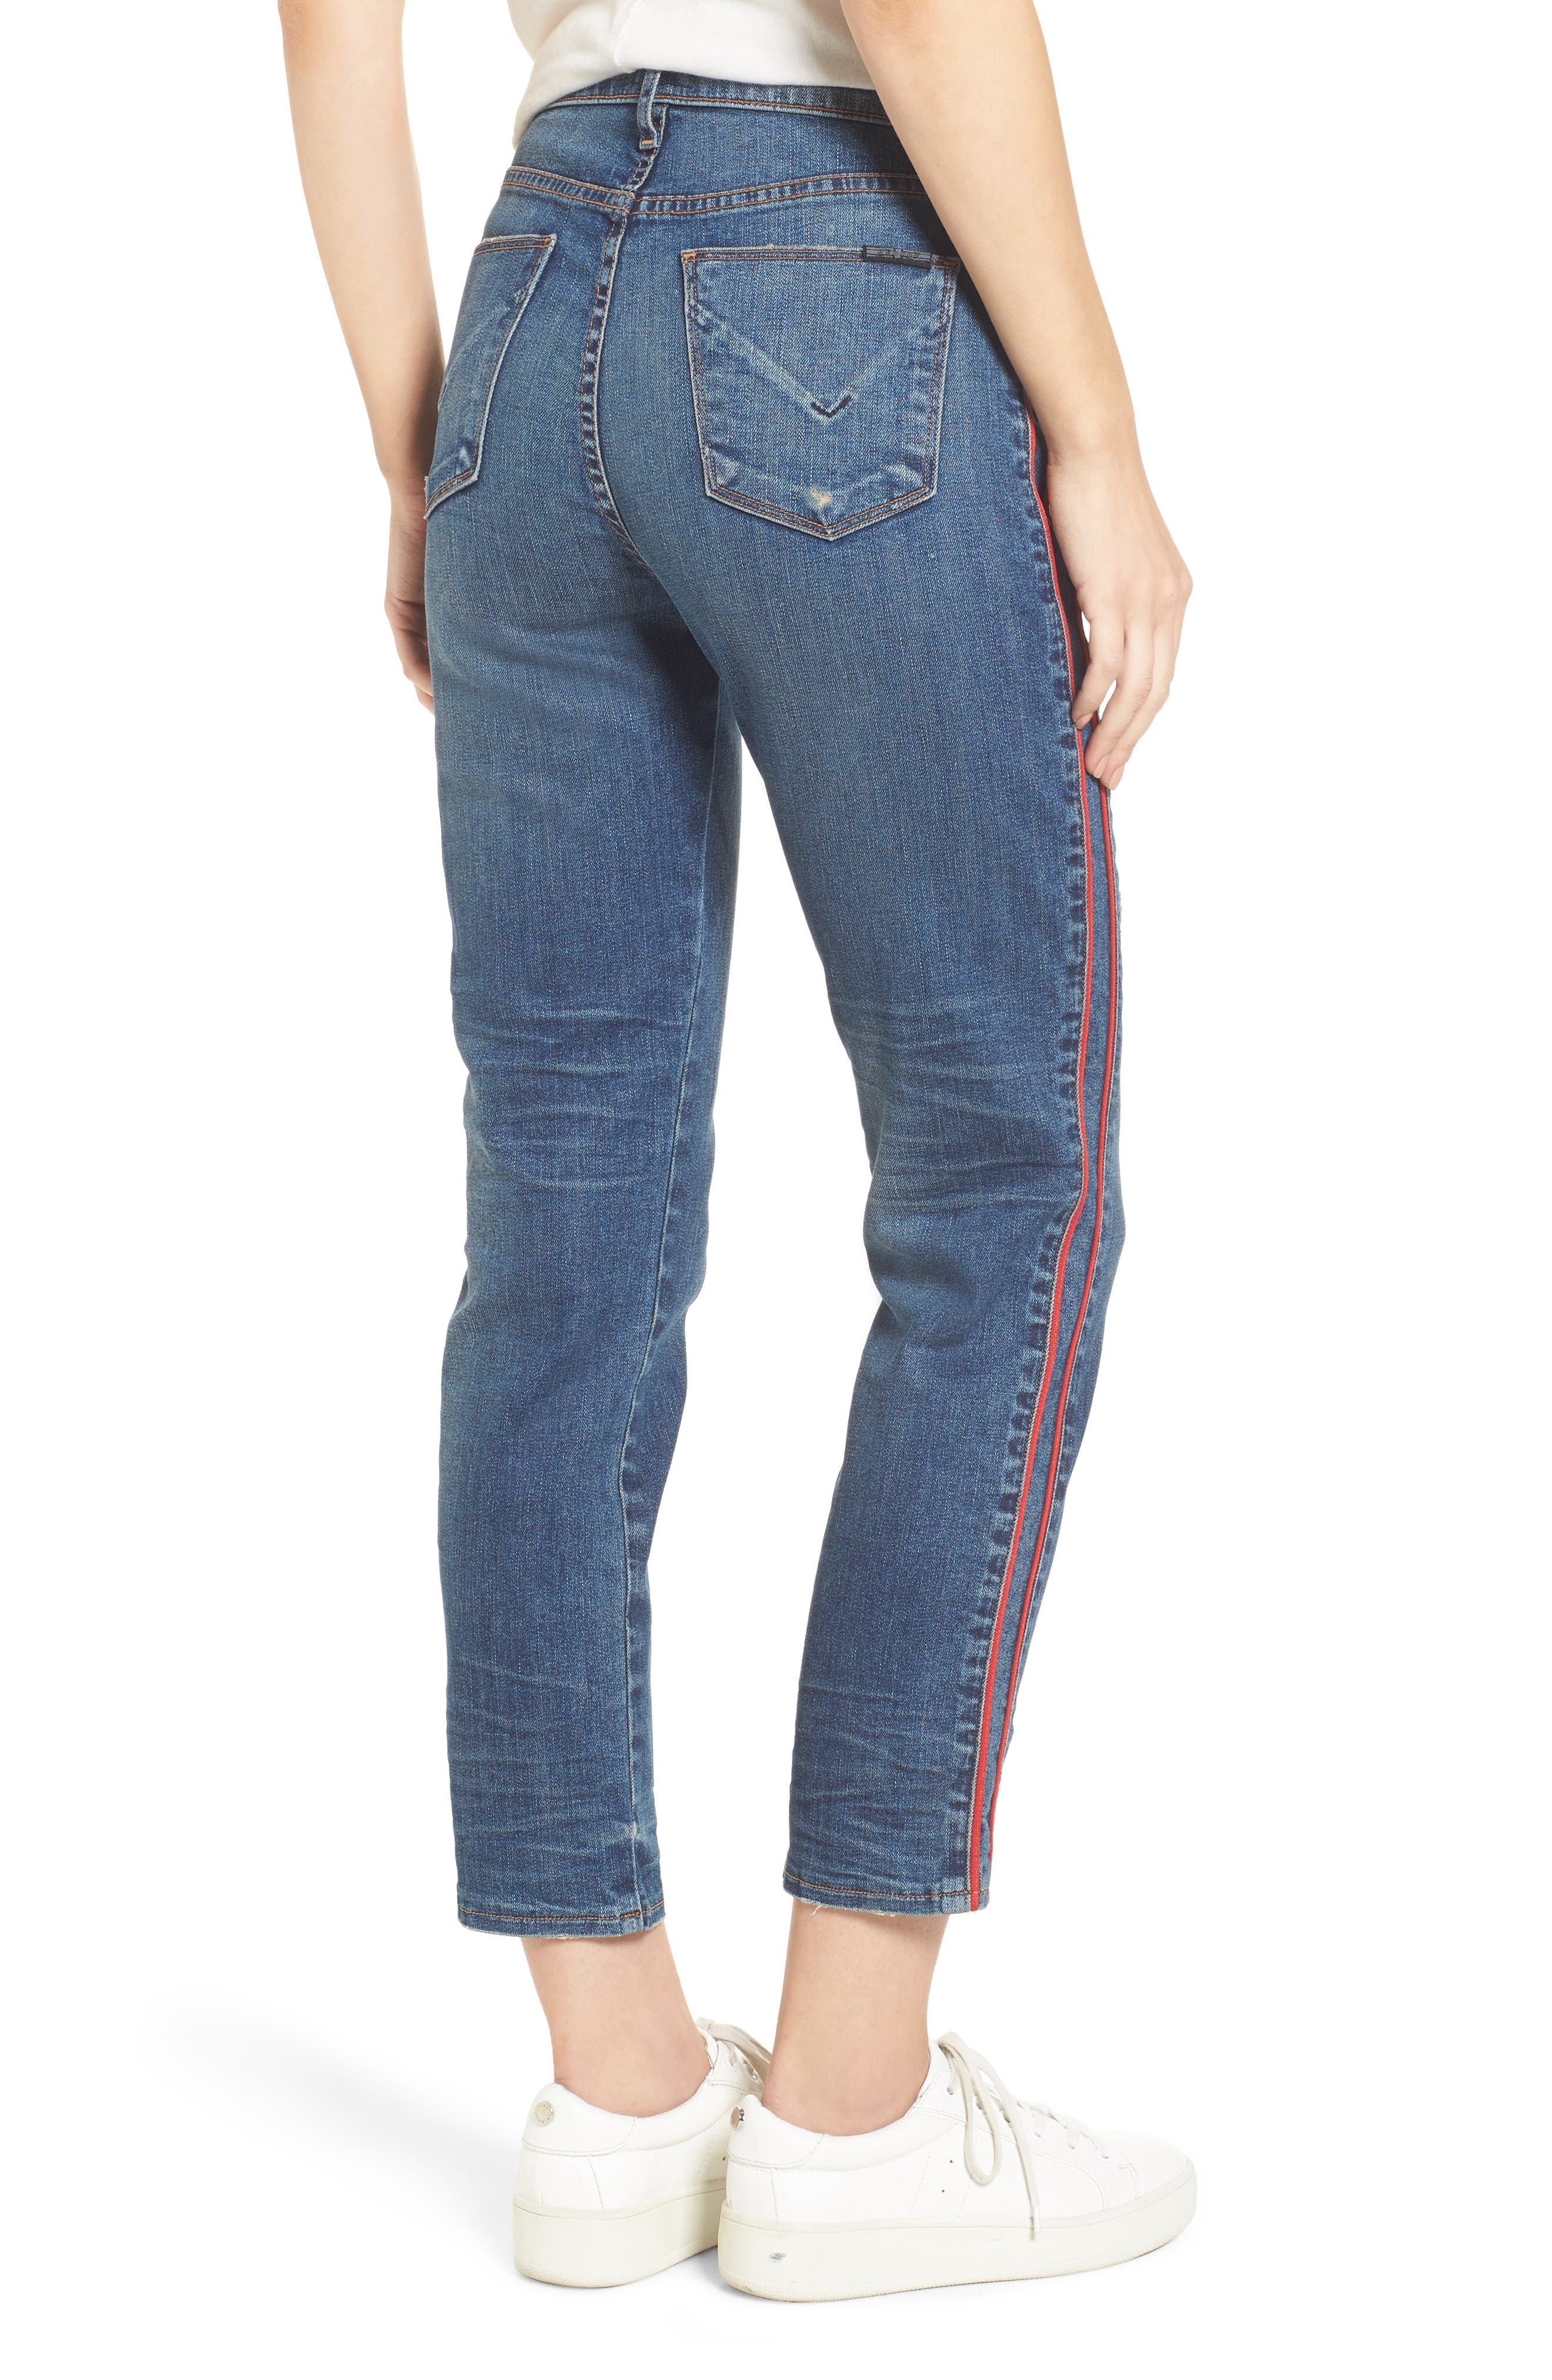 Zoeey High Waist Crop Jeans,                             Alternate thumbnail 2, color,                             460